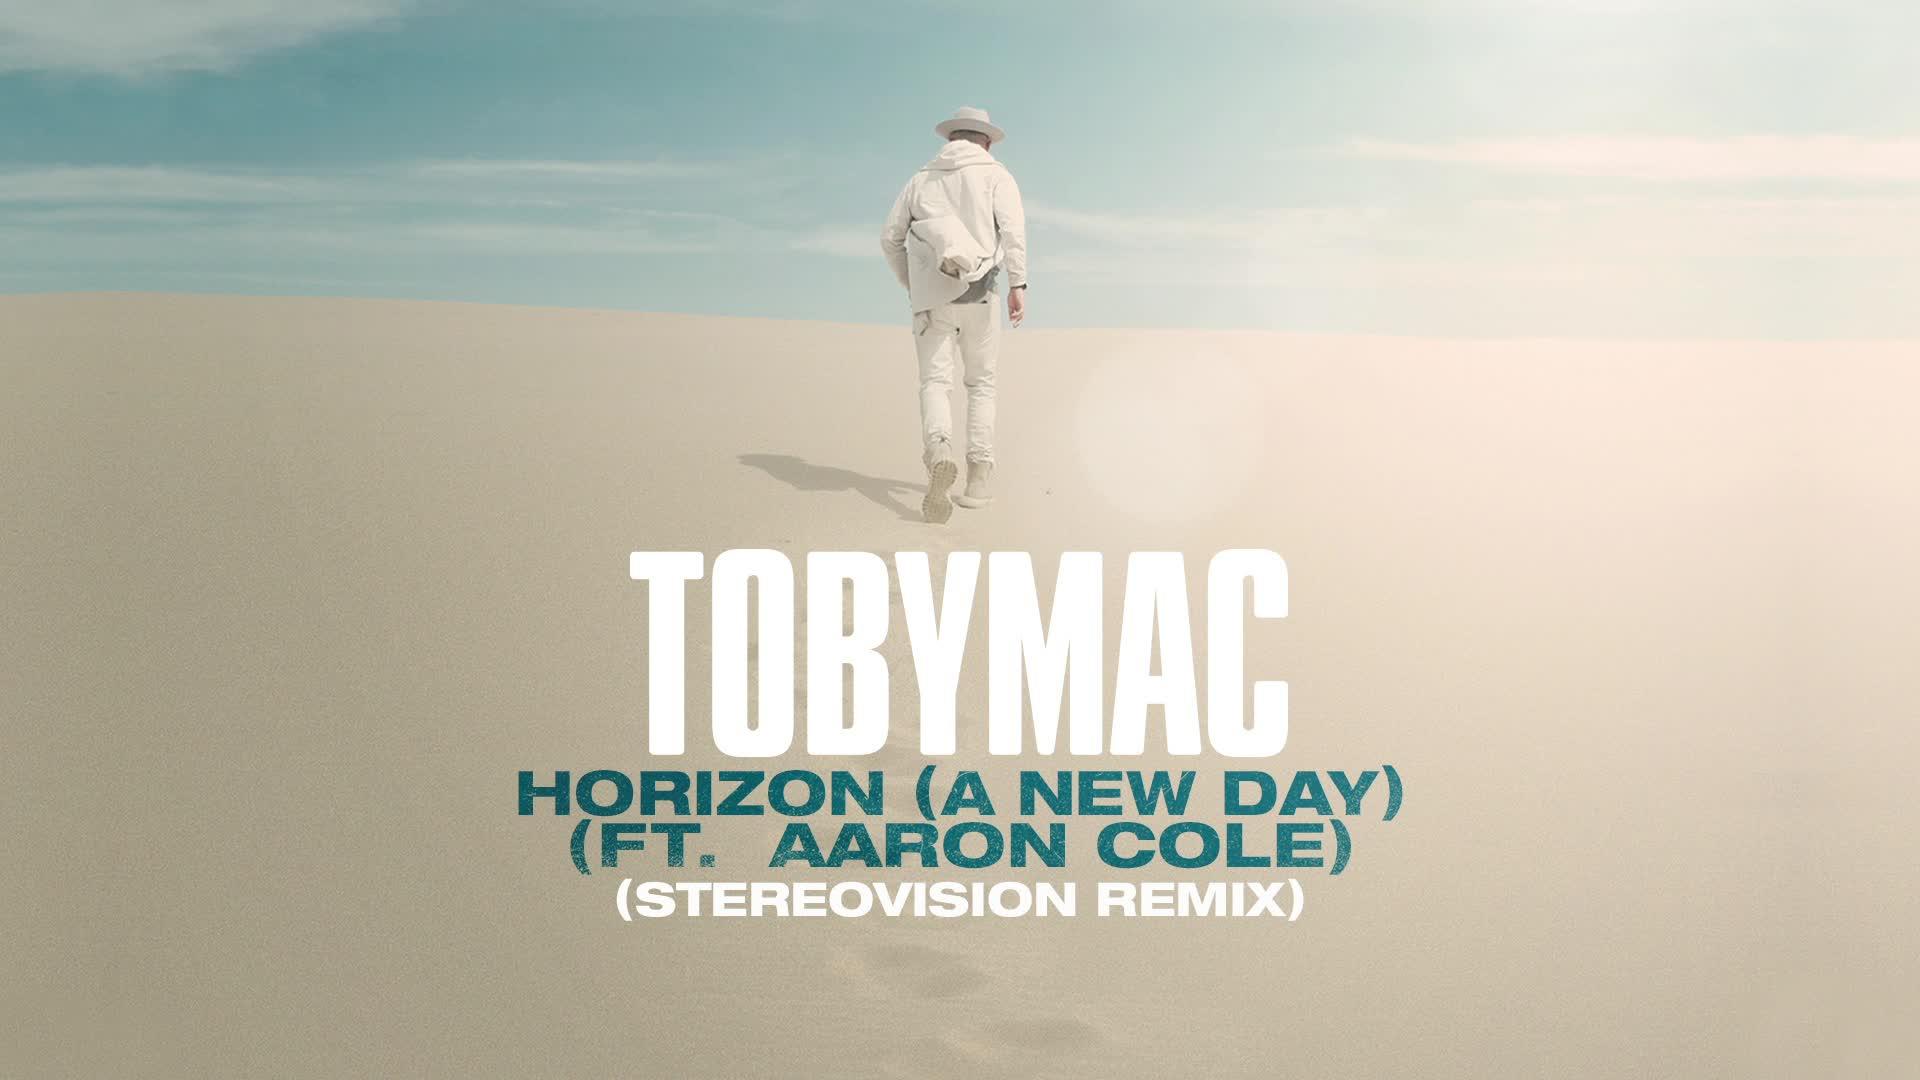 TobyMac - Horizon (A New Day)